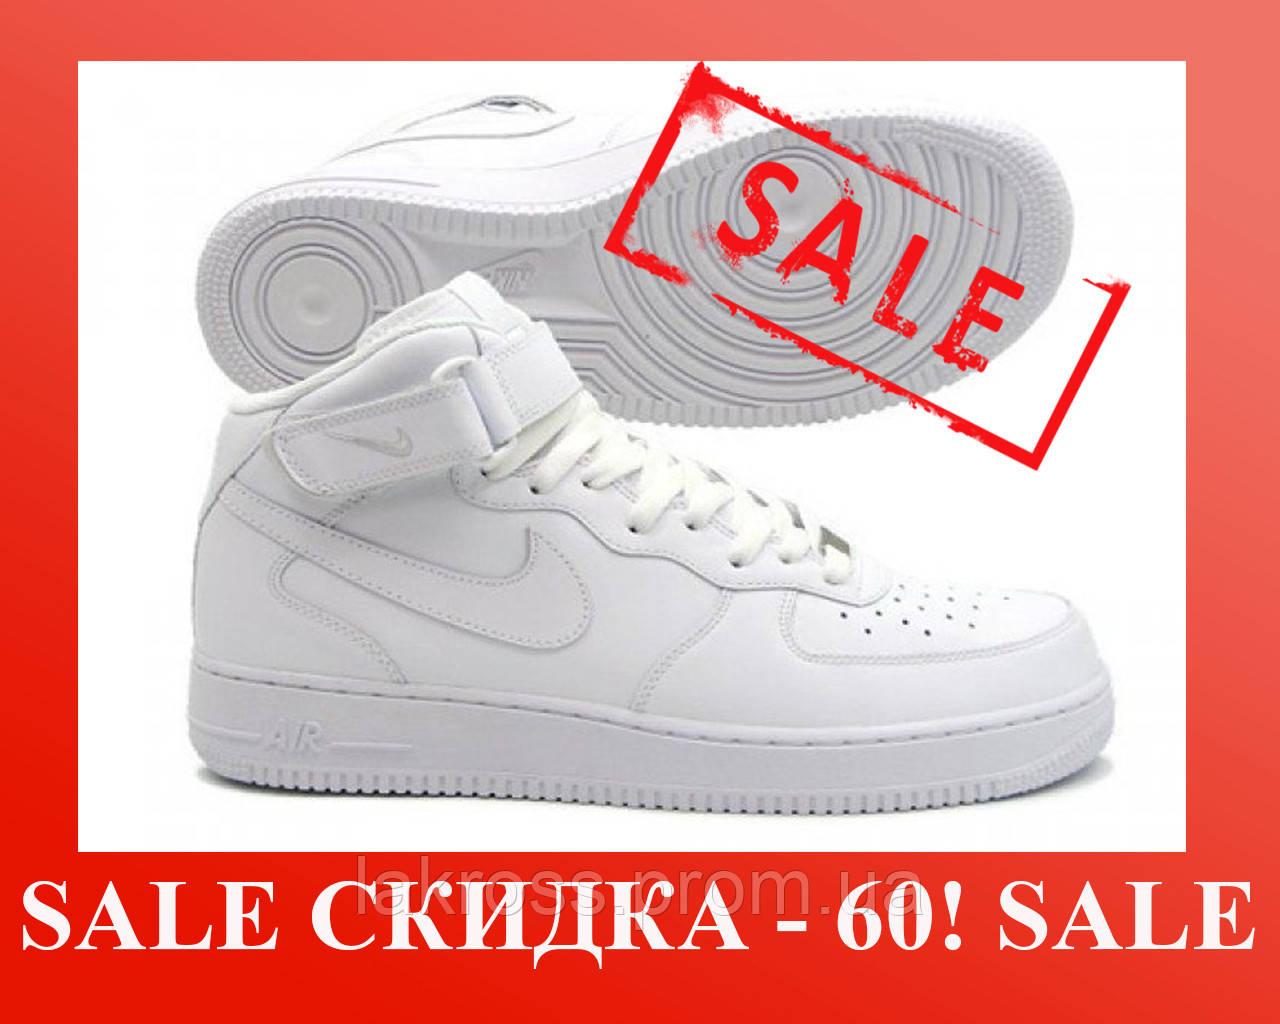 Кроссовки Nike Air Force High White (БЕЛЫЕ) СКИДКА -60%, цена 678 ... 76117b3c62a